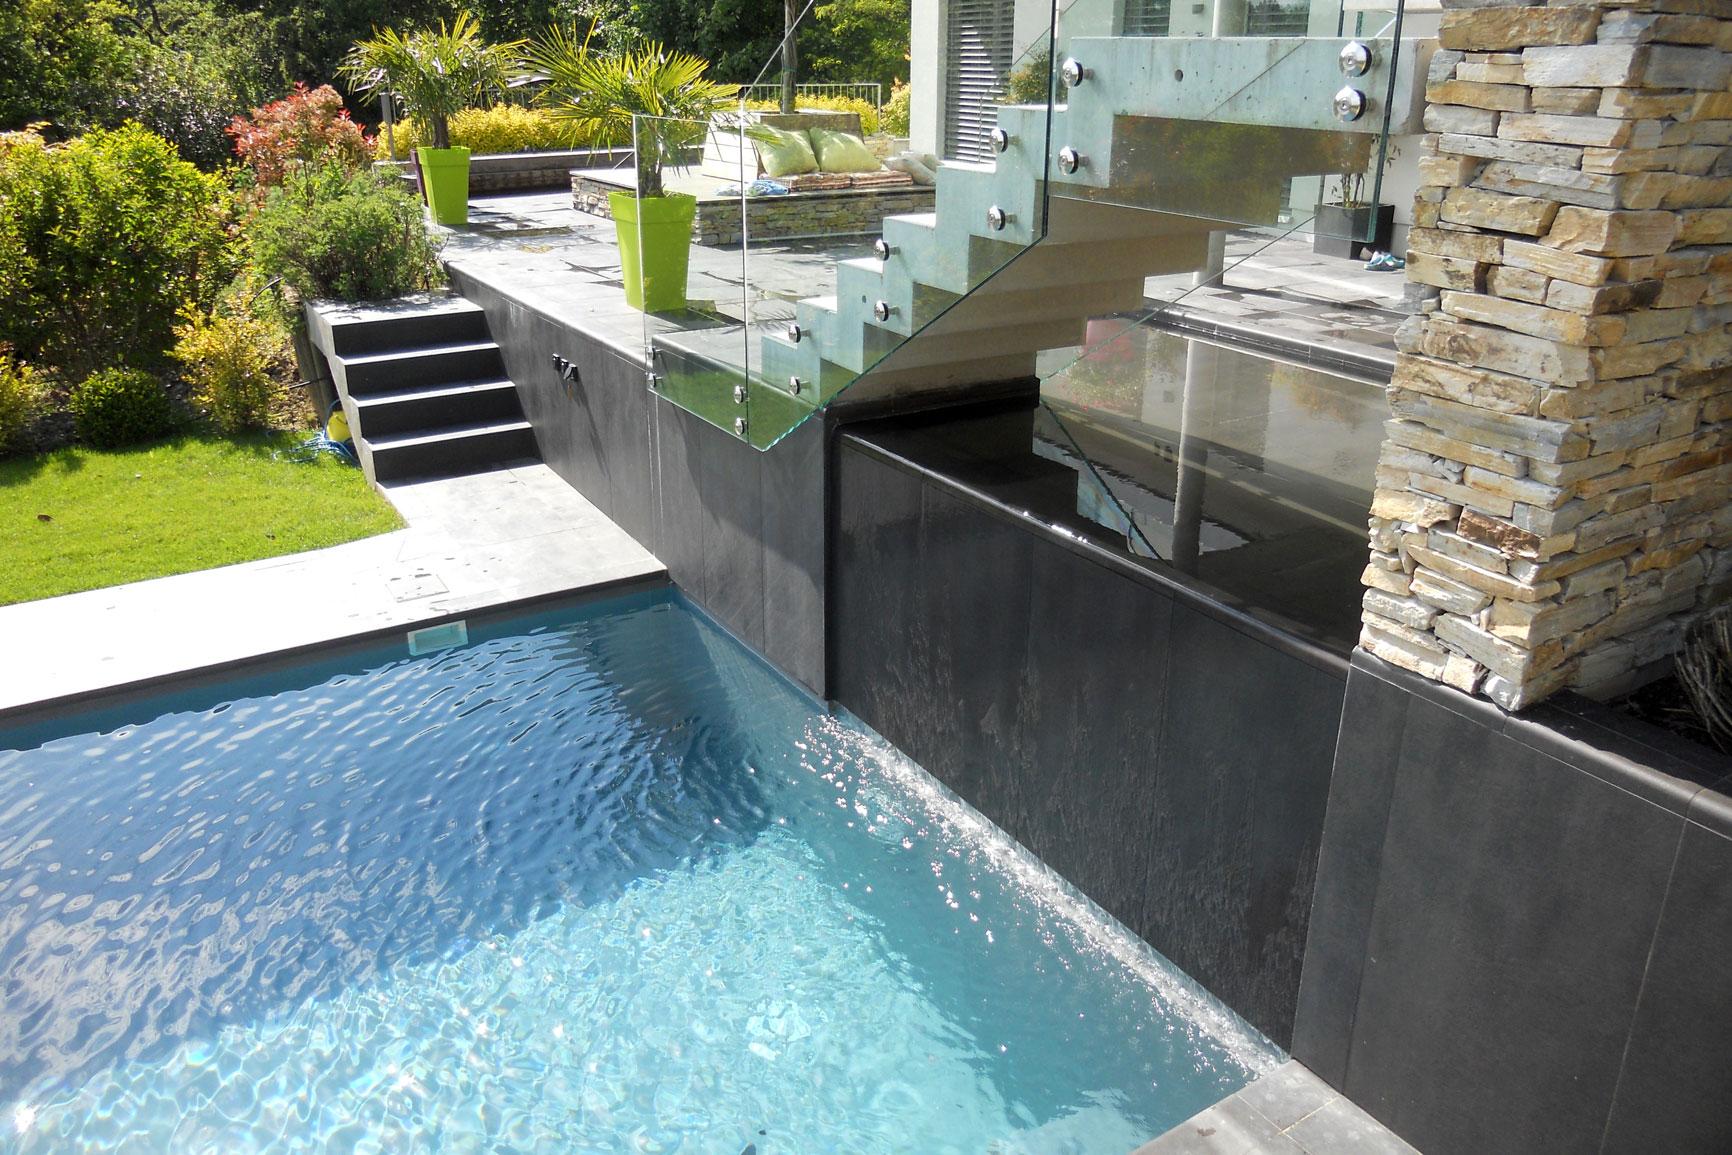 Classique liner piscines widmer for Petit bassin piscine